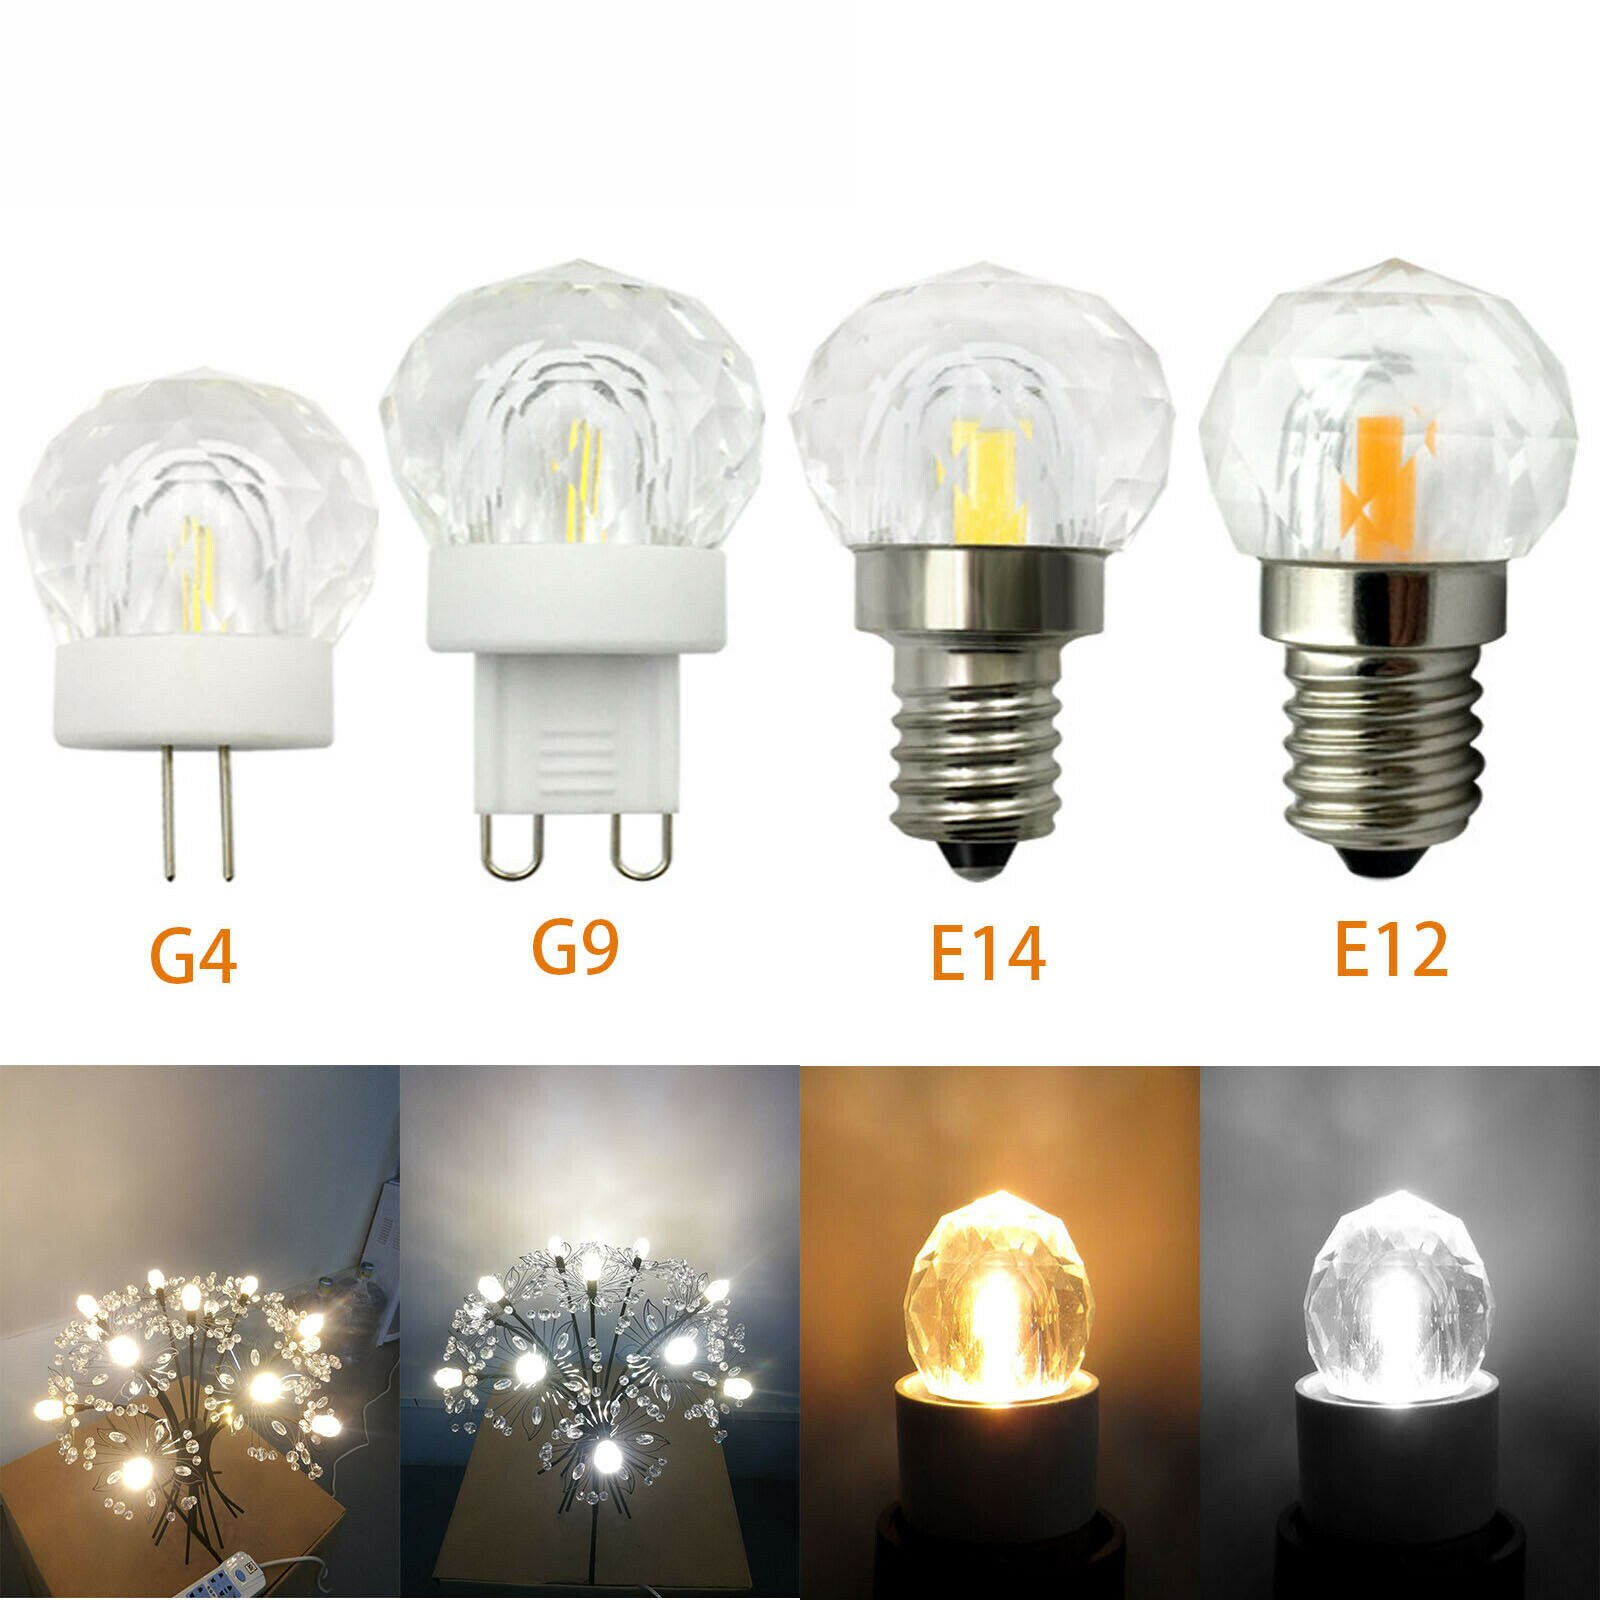 Regulable 110V 220V Mini G4 G9 E12 E14 4W LED K9 bombillas de cristal COB reemplazar la lámpara de halógeno lámparas colgantes